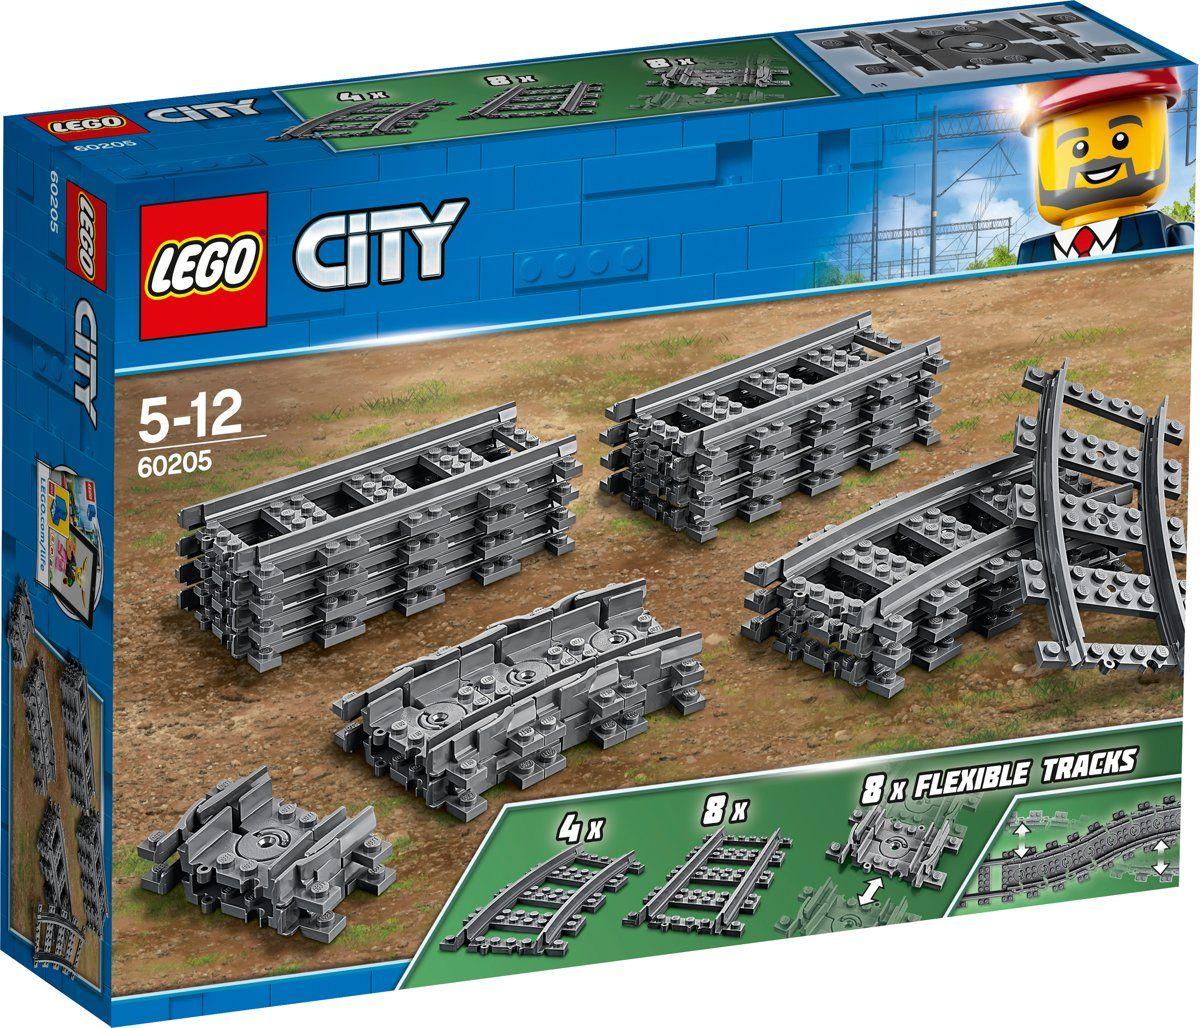 Lego City - 60205 - Treinrails